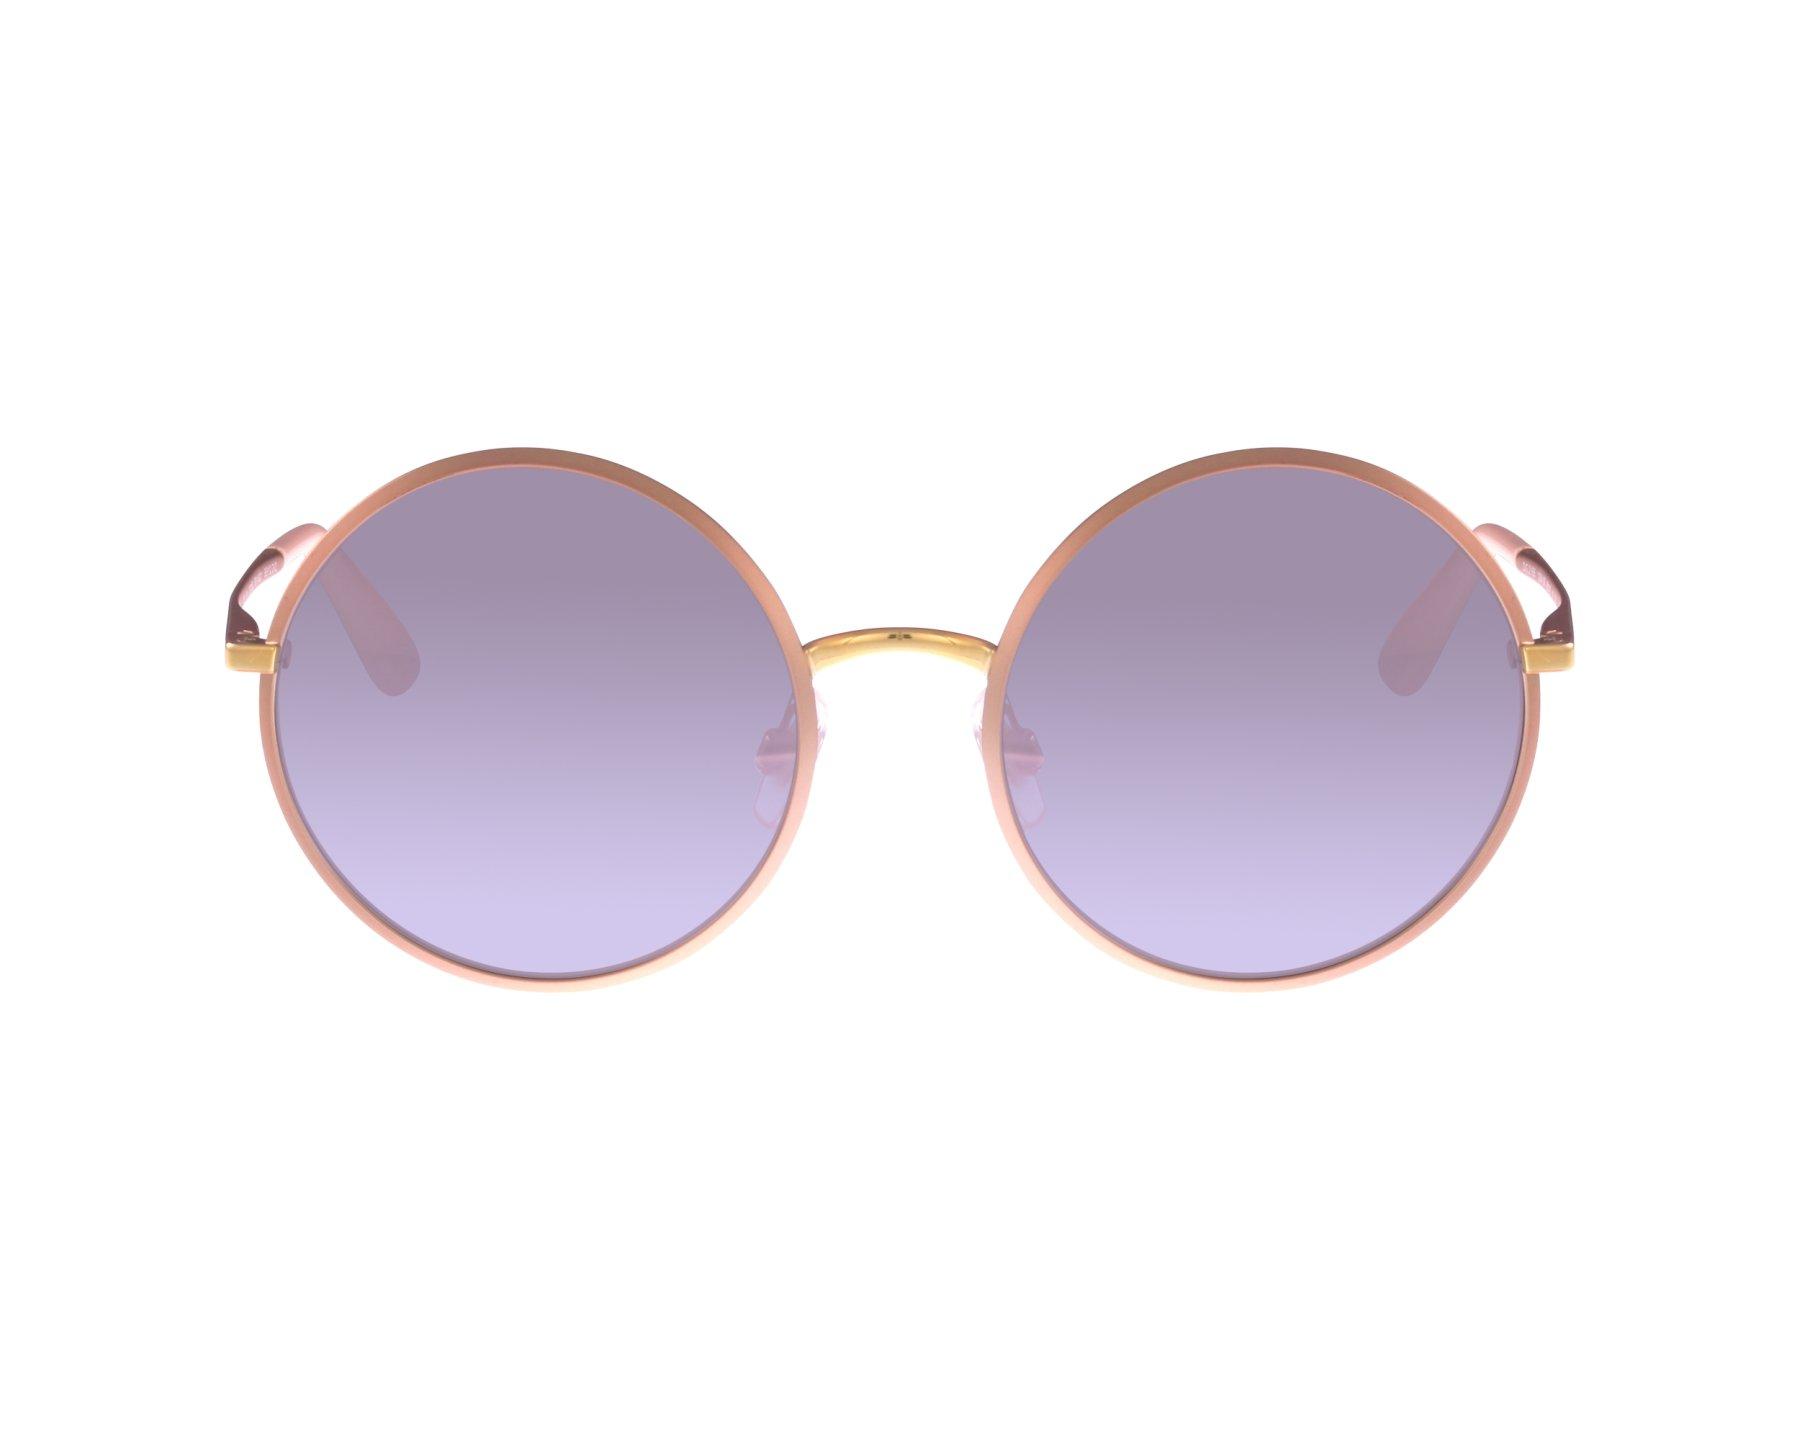 5d2e177df0a Sunglasses Dolce   Gabbana DG-2155 1294 5R 56-20 Pink Gold profile